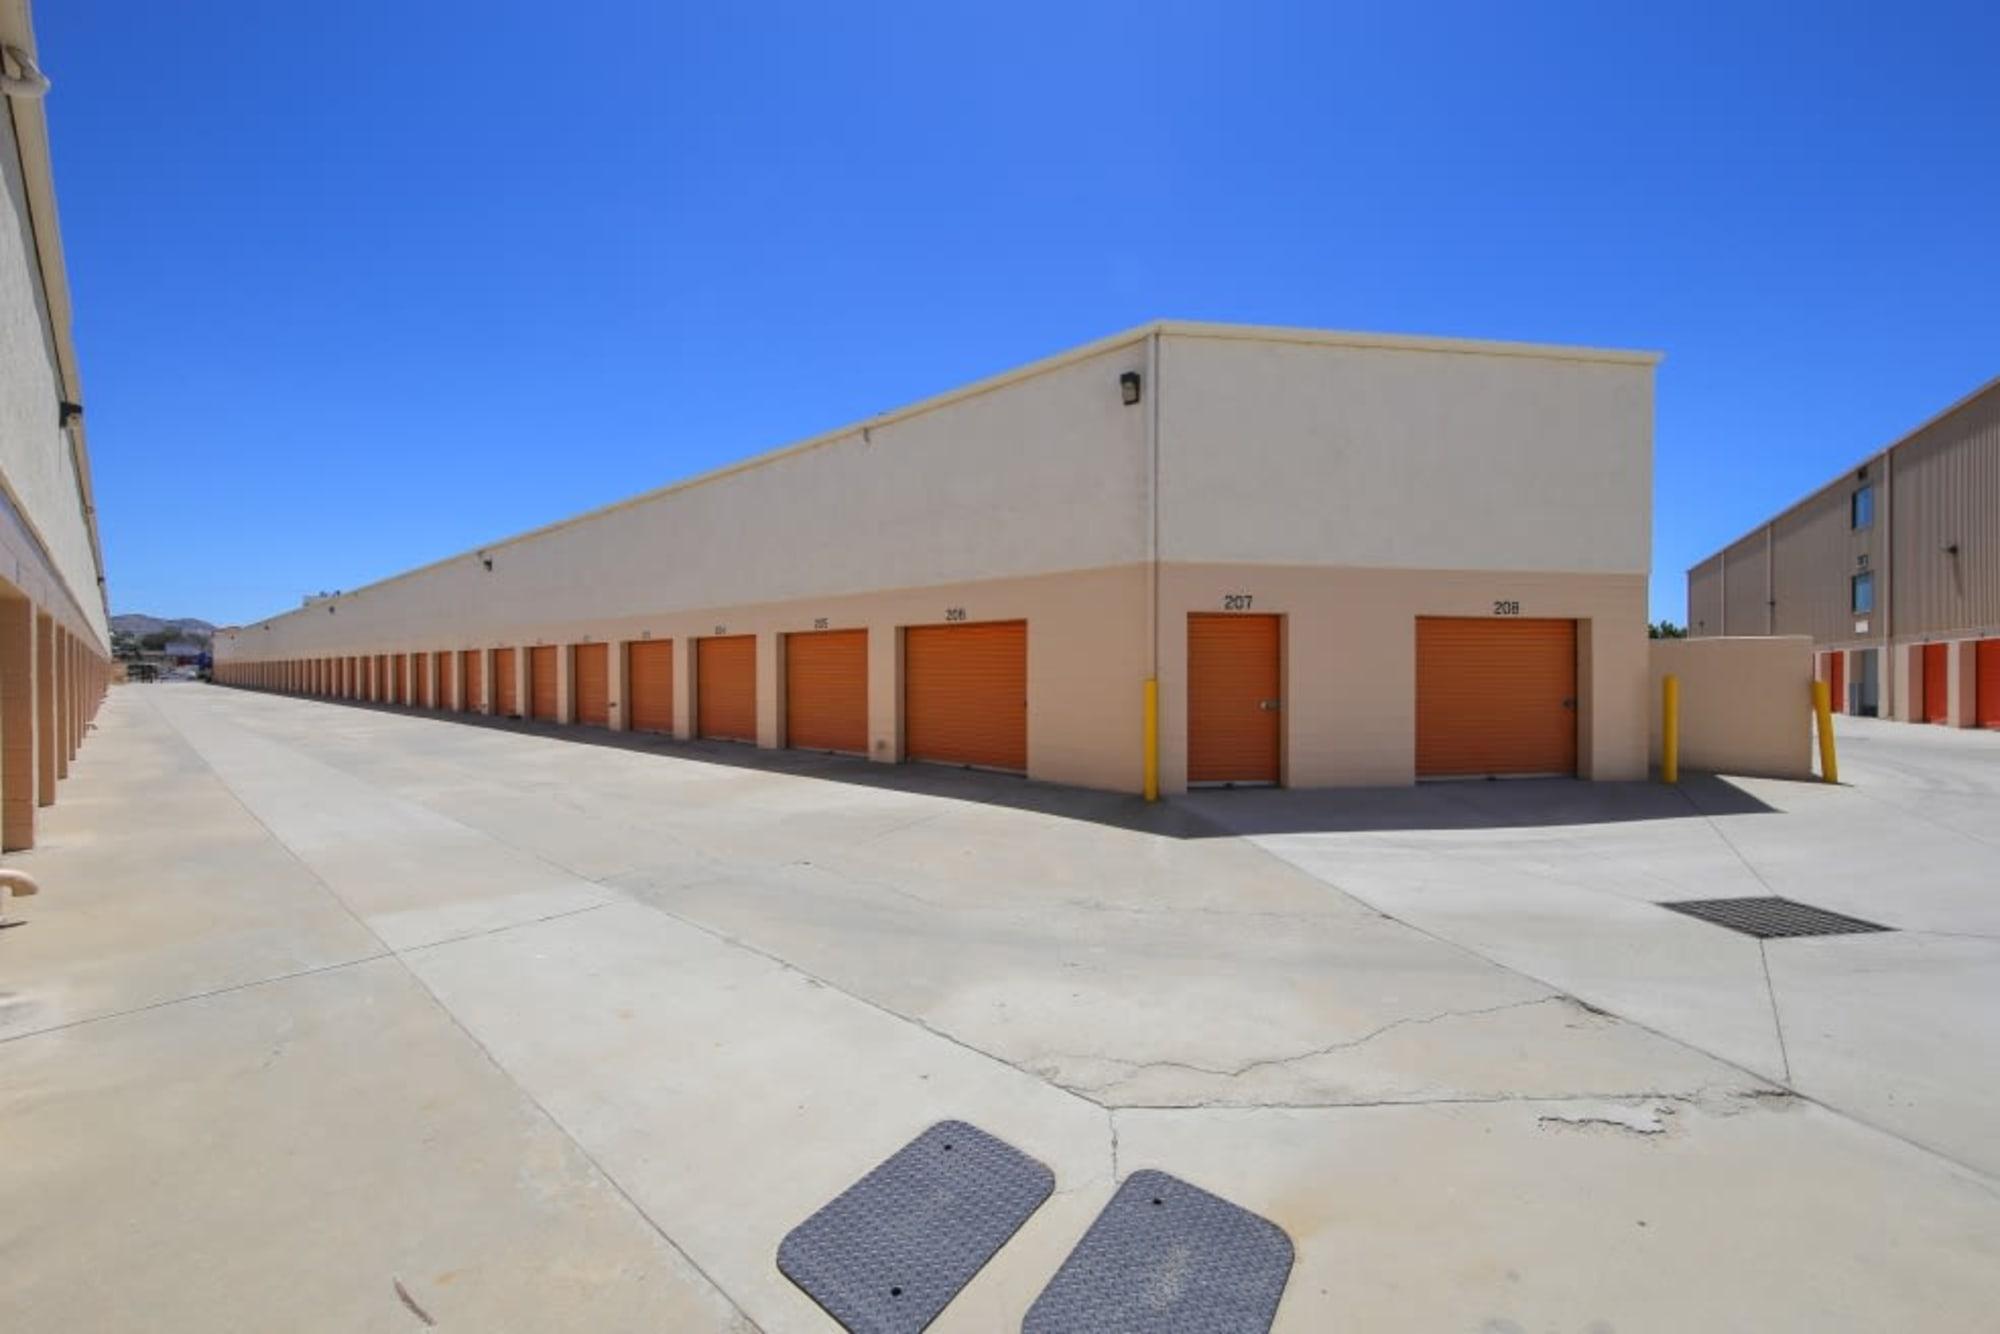 Drive-up storage units at A-1 Self Storage in El Cajon, California